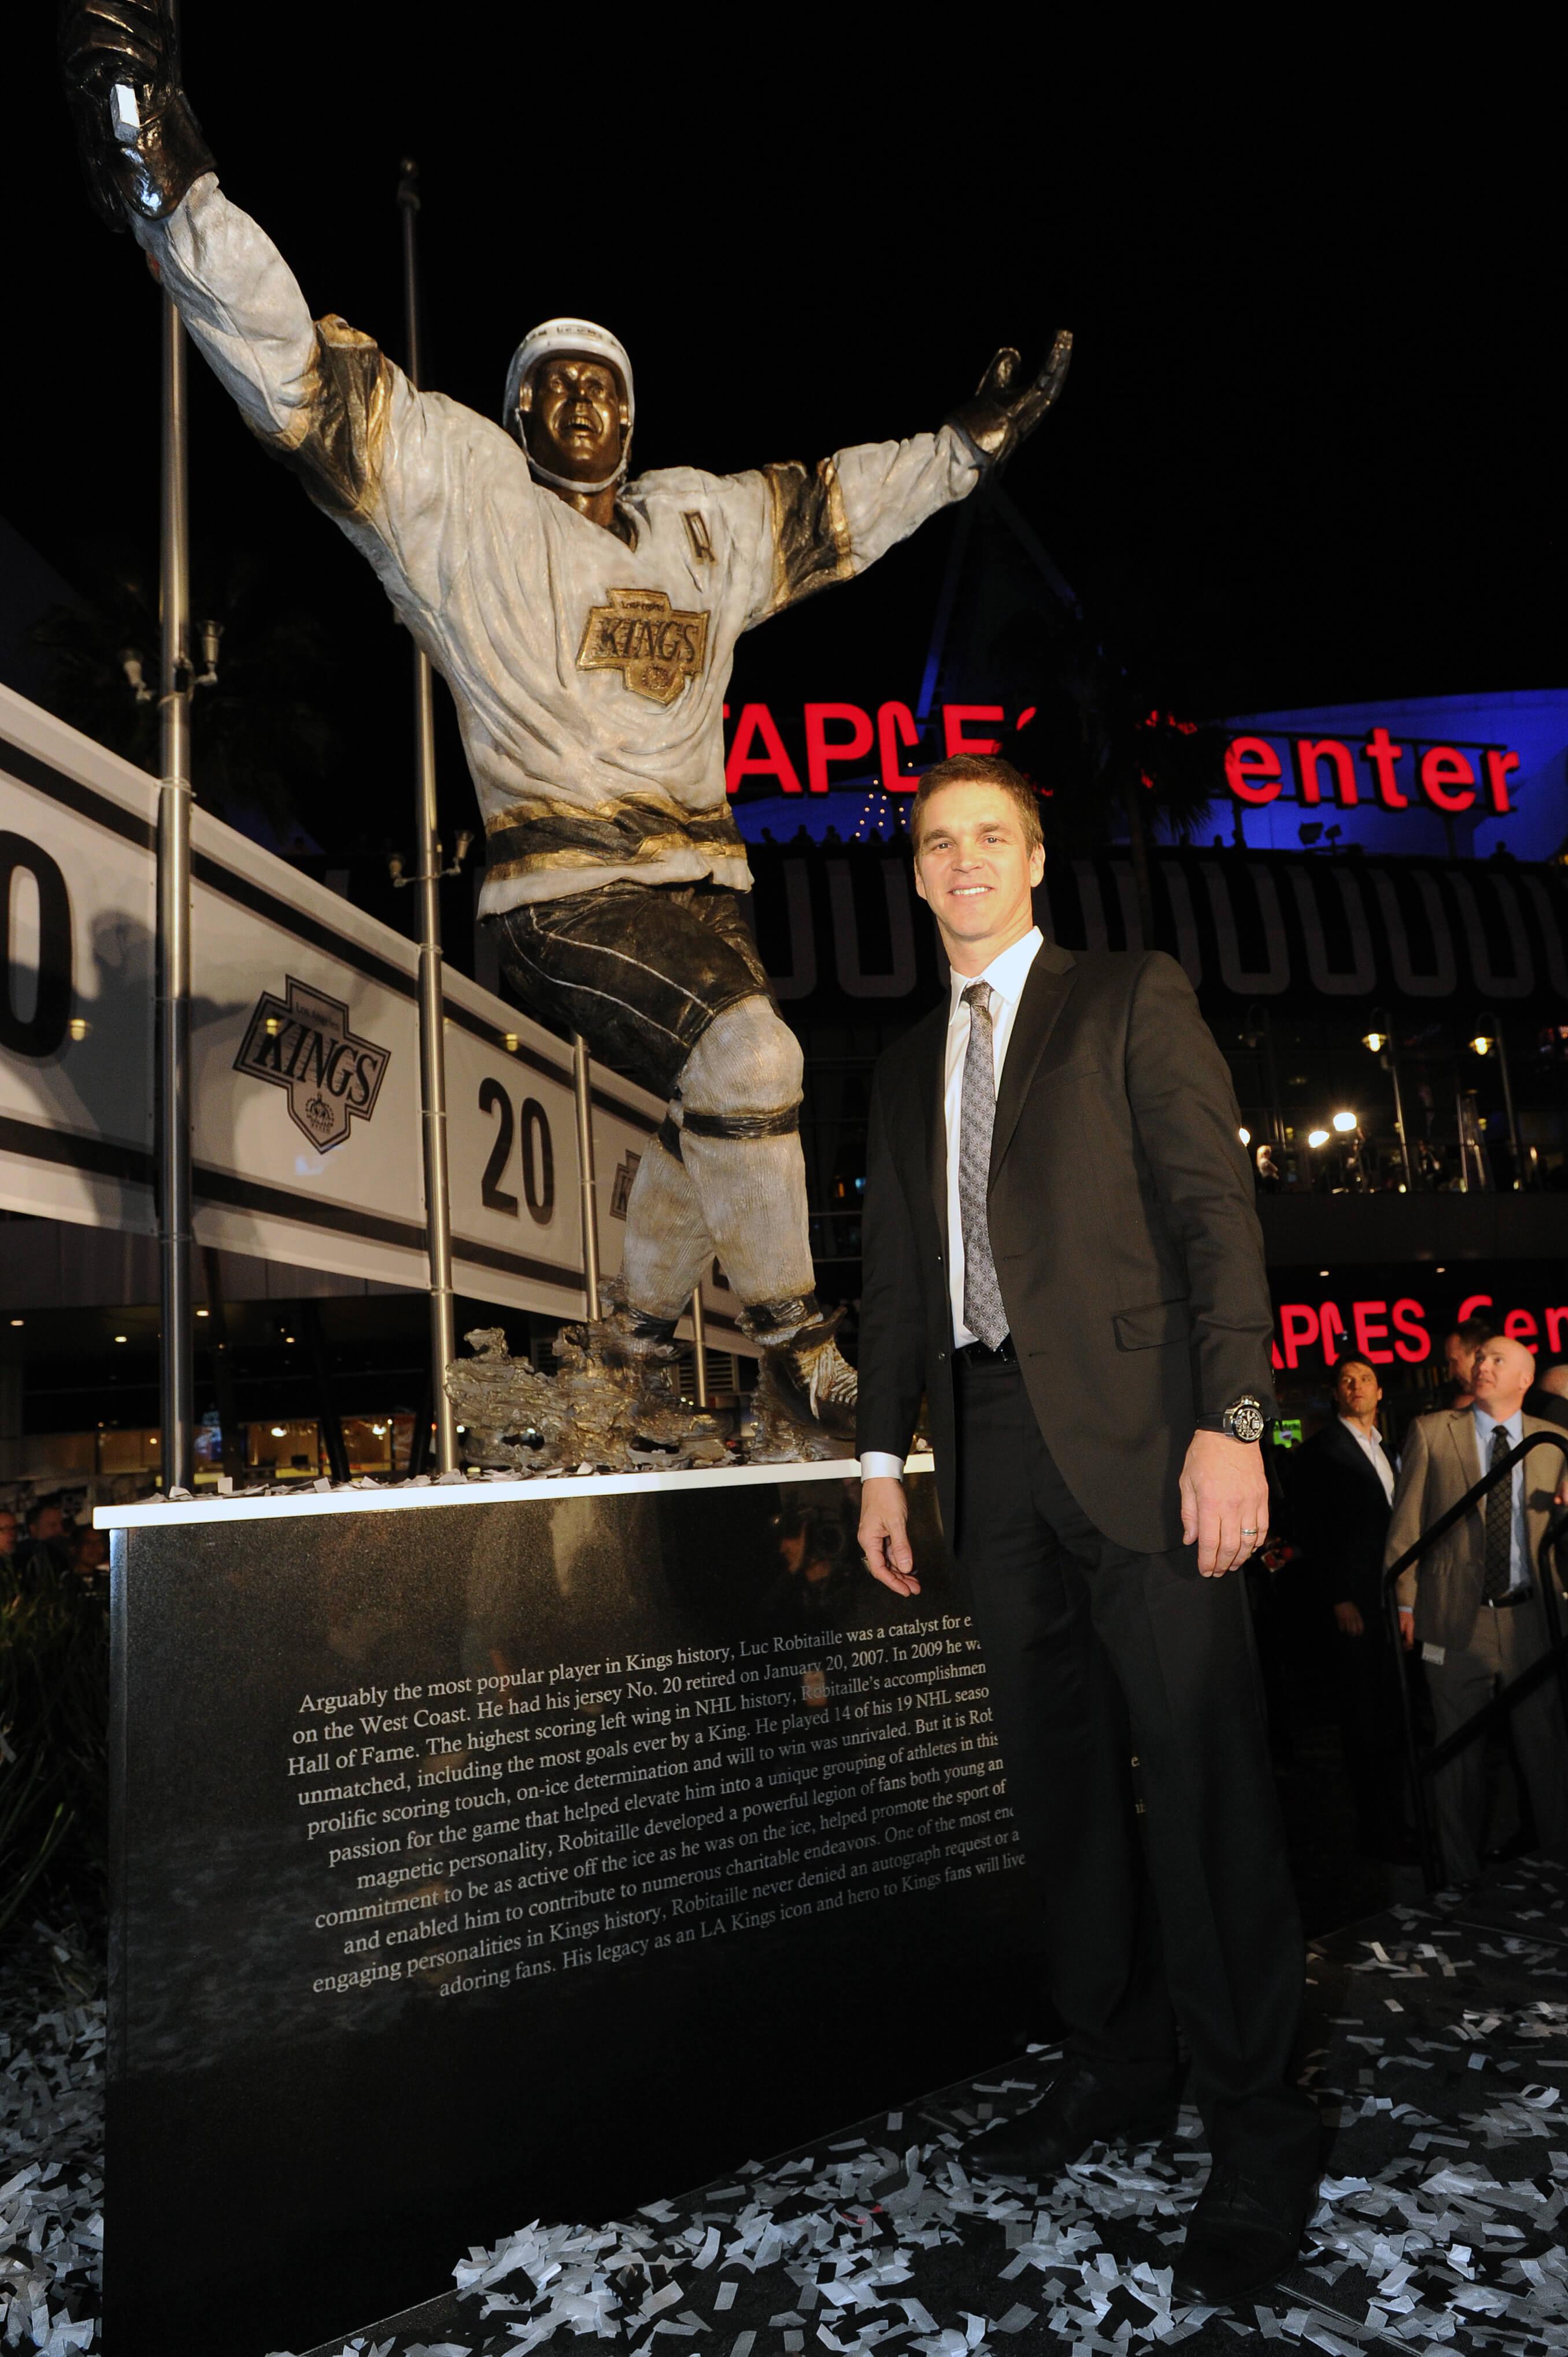 Luc Robitaille statue, LA Kings, NHL, Staples Center